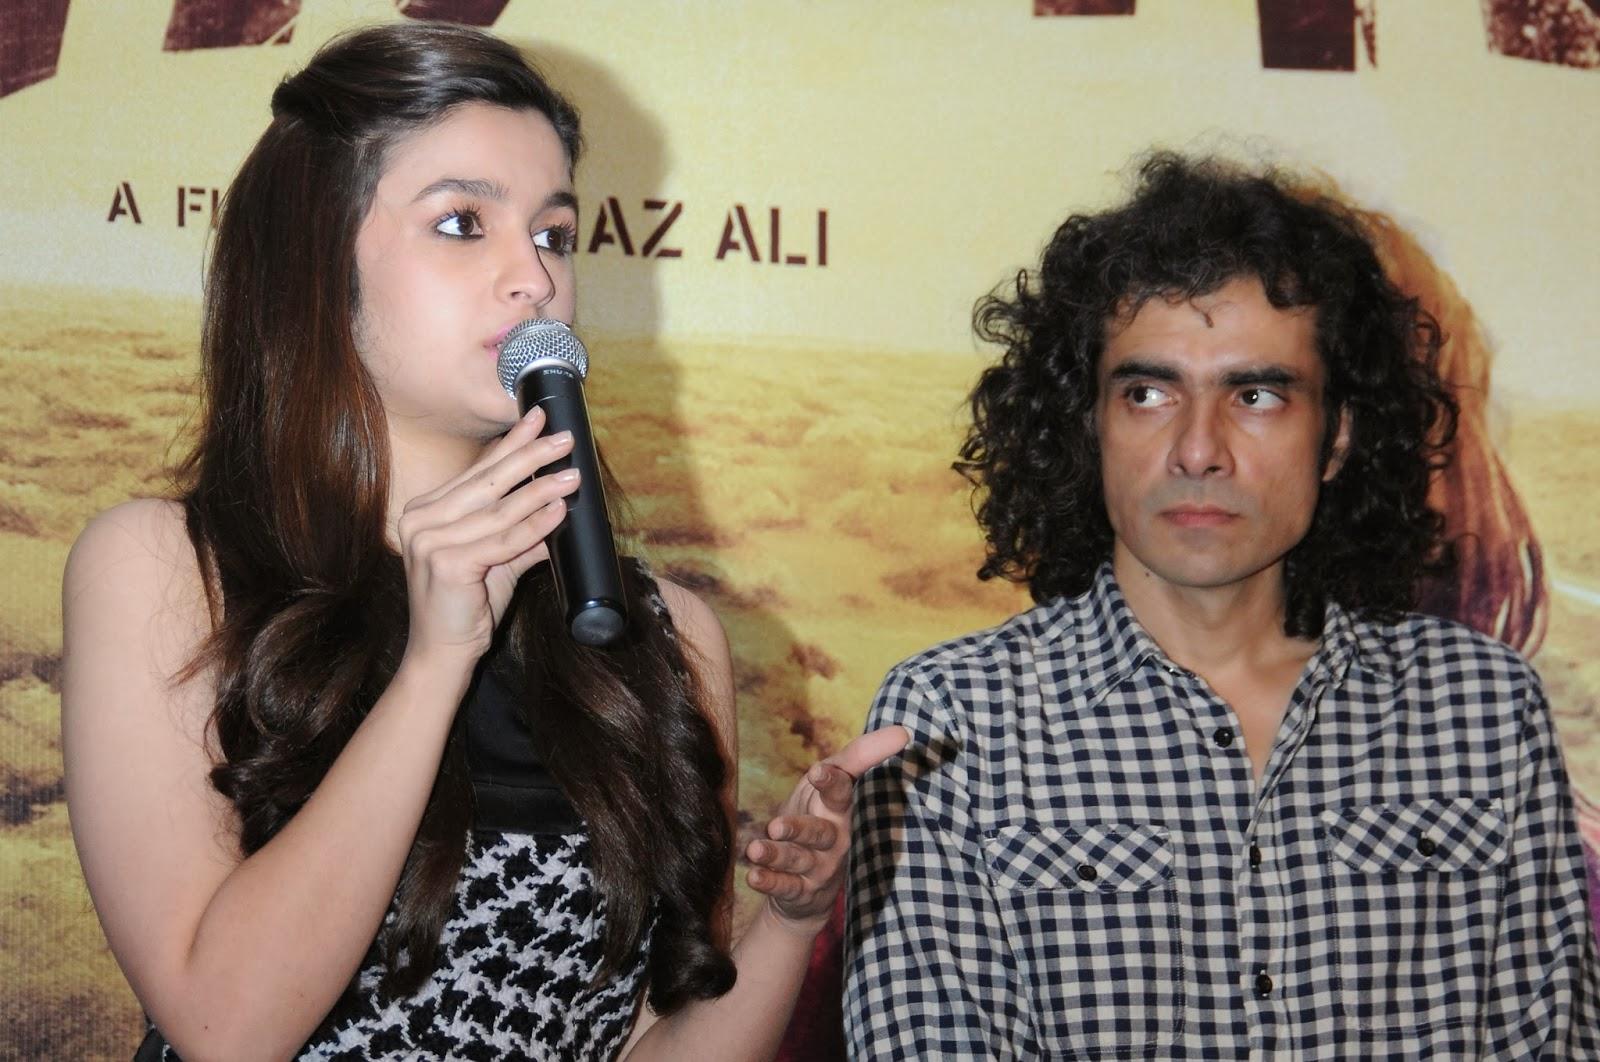 http://4.bp.blogspot.com/-EkZ81u7VZAQ/UwN-Uf71roI/AAAAAAAAlSc/jMeZosa9m8w/s1600/Alia+Bhatt+and+Imtiaz+Ali+promote+their+upcoming+film+Highway+at+Bangalore+(4).jpg